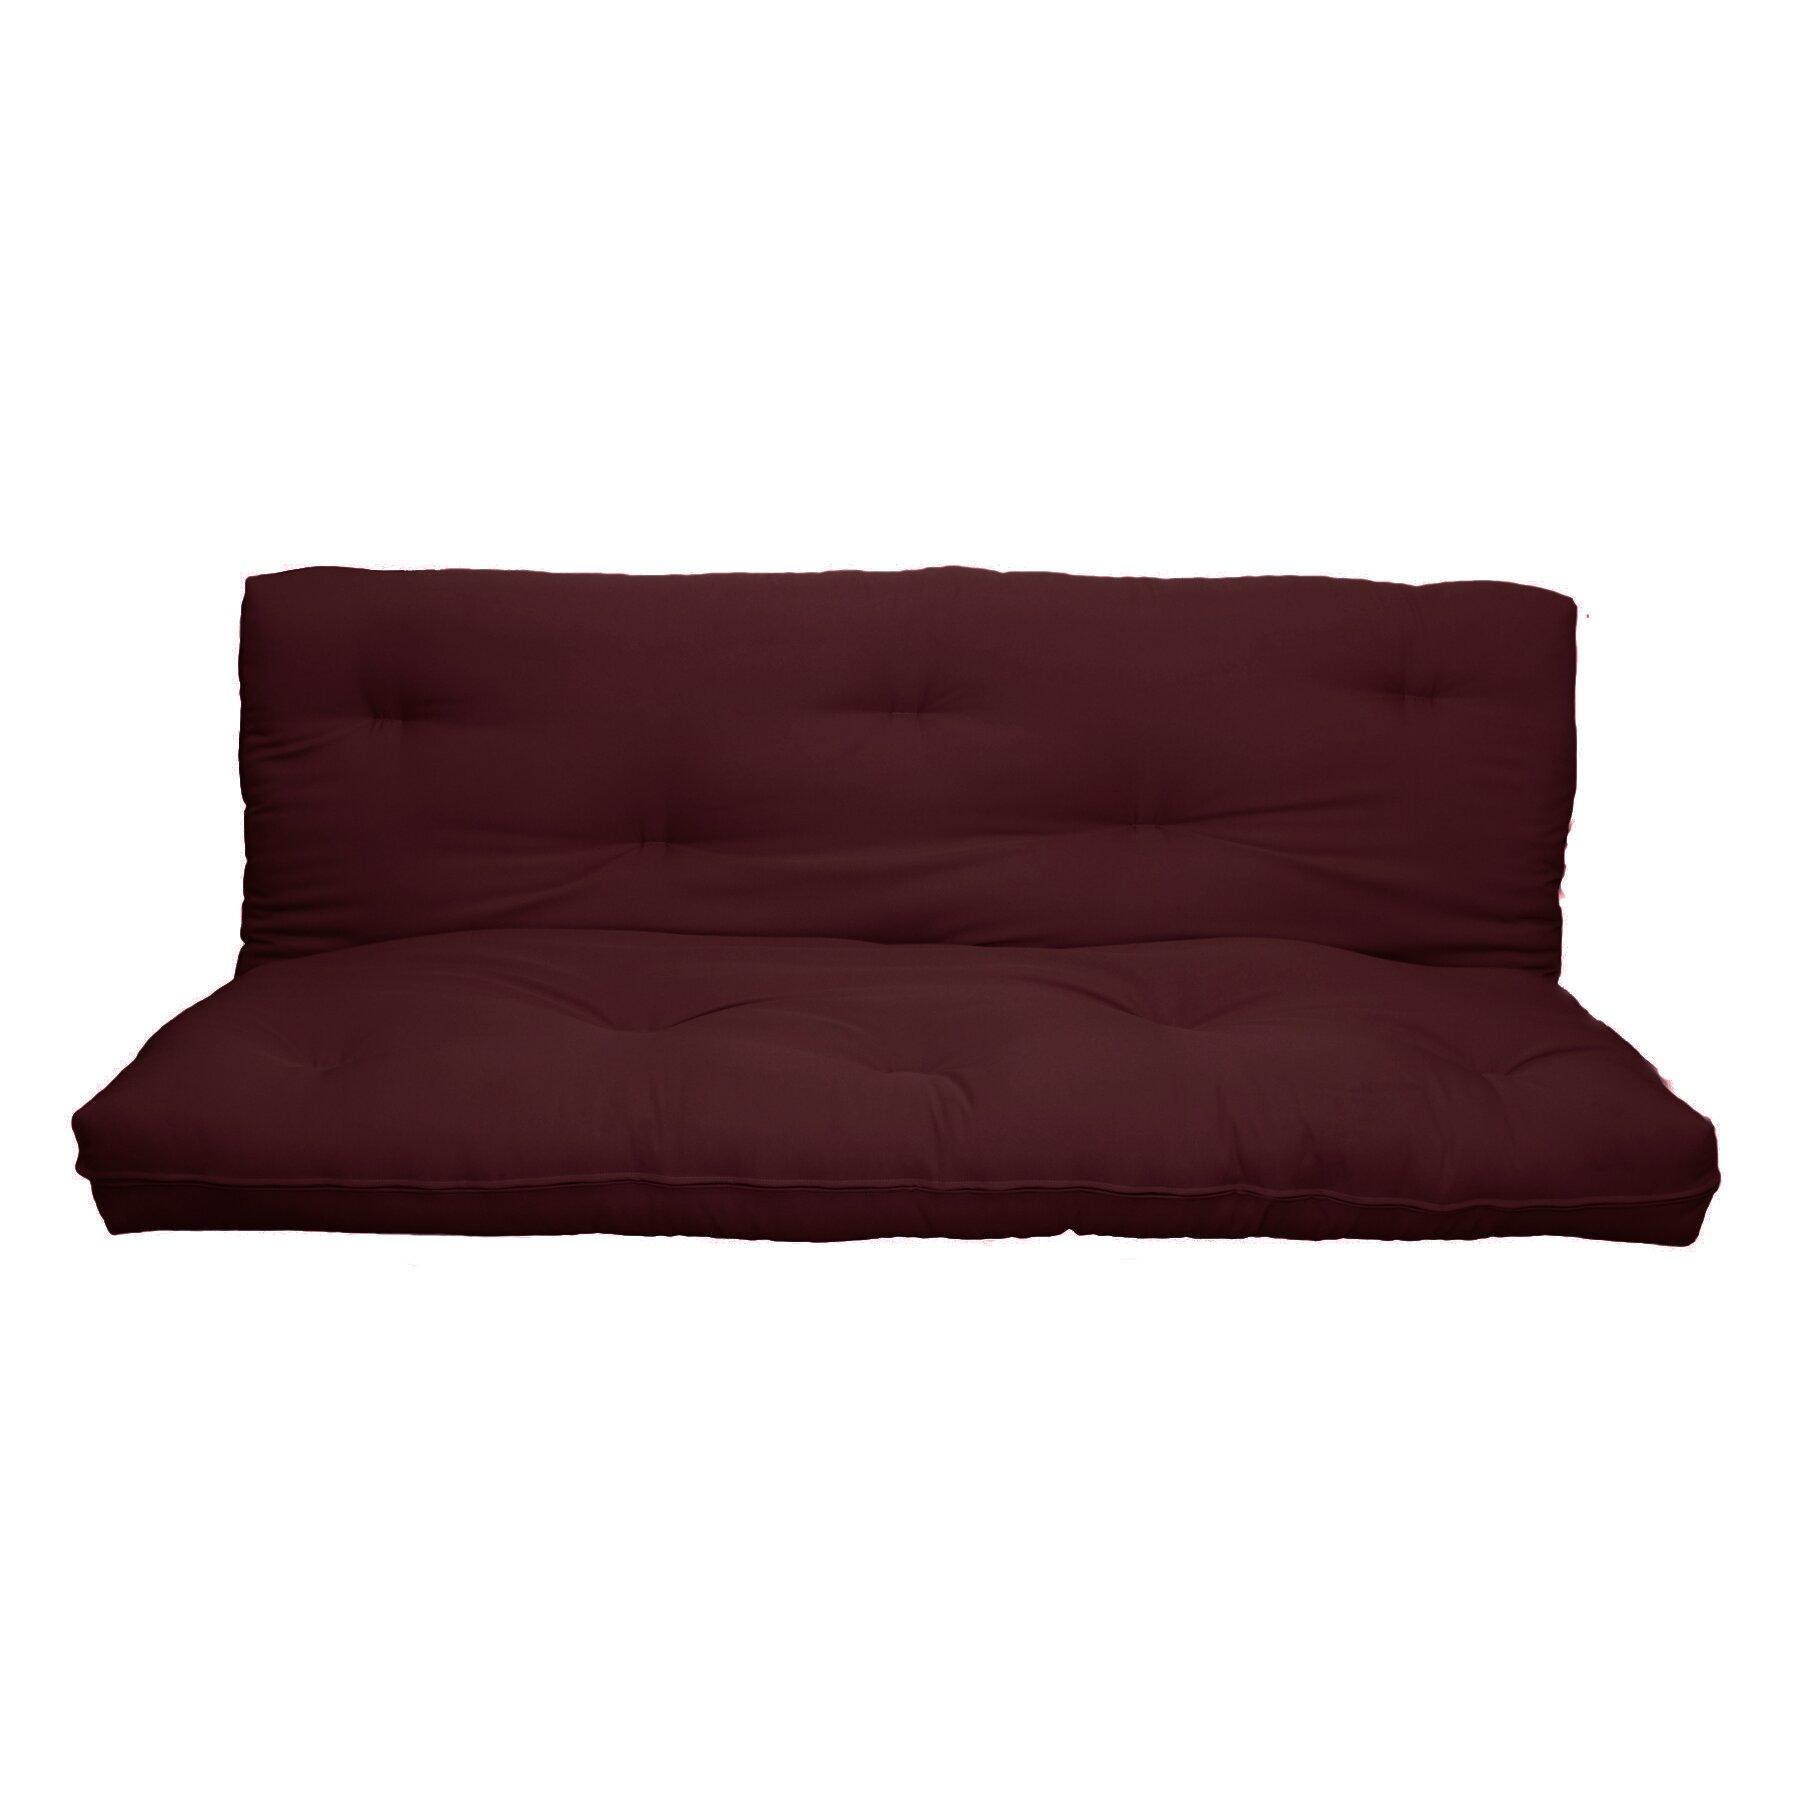 Milton green star 6quot replacement full size futon mattress for Full size futon dimensions